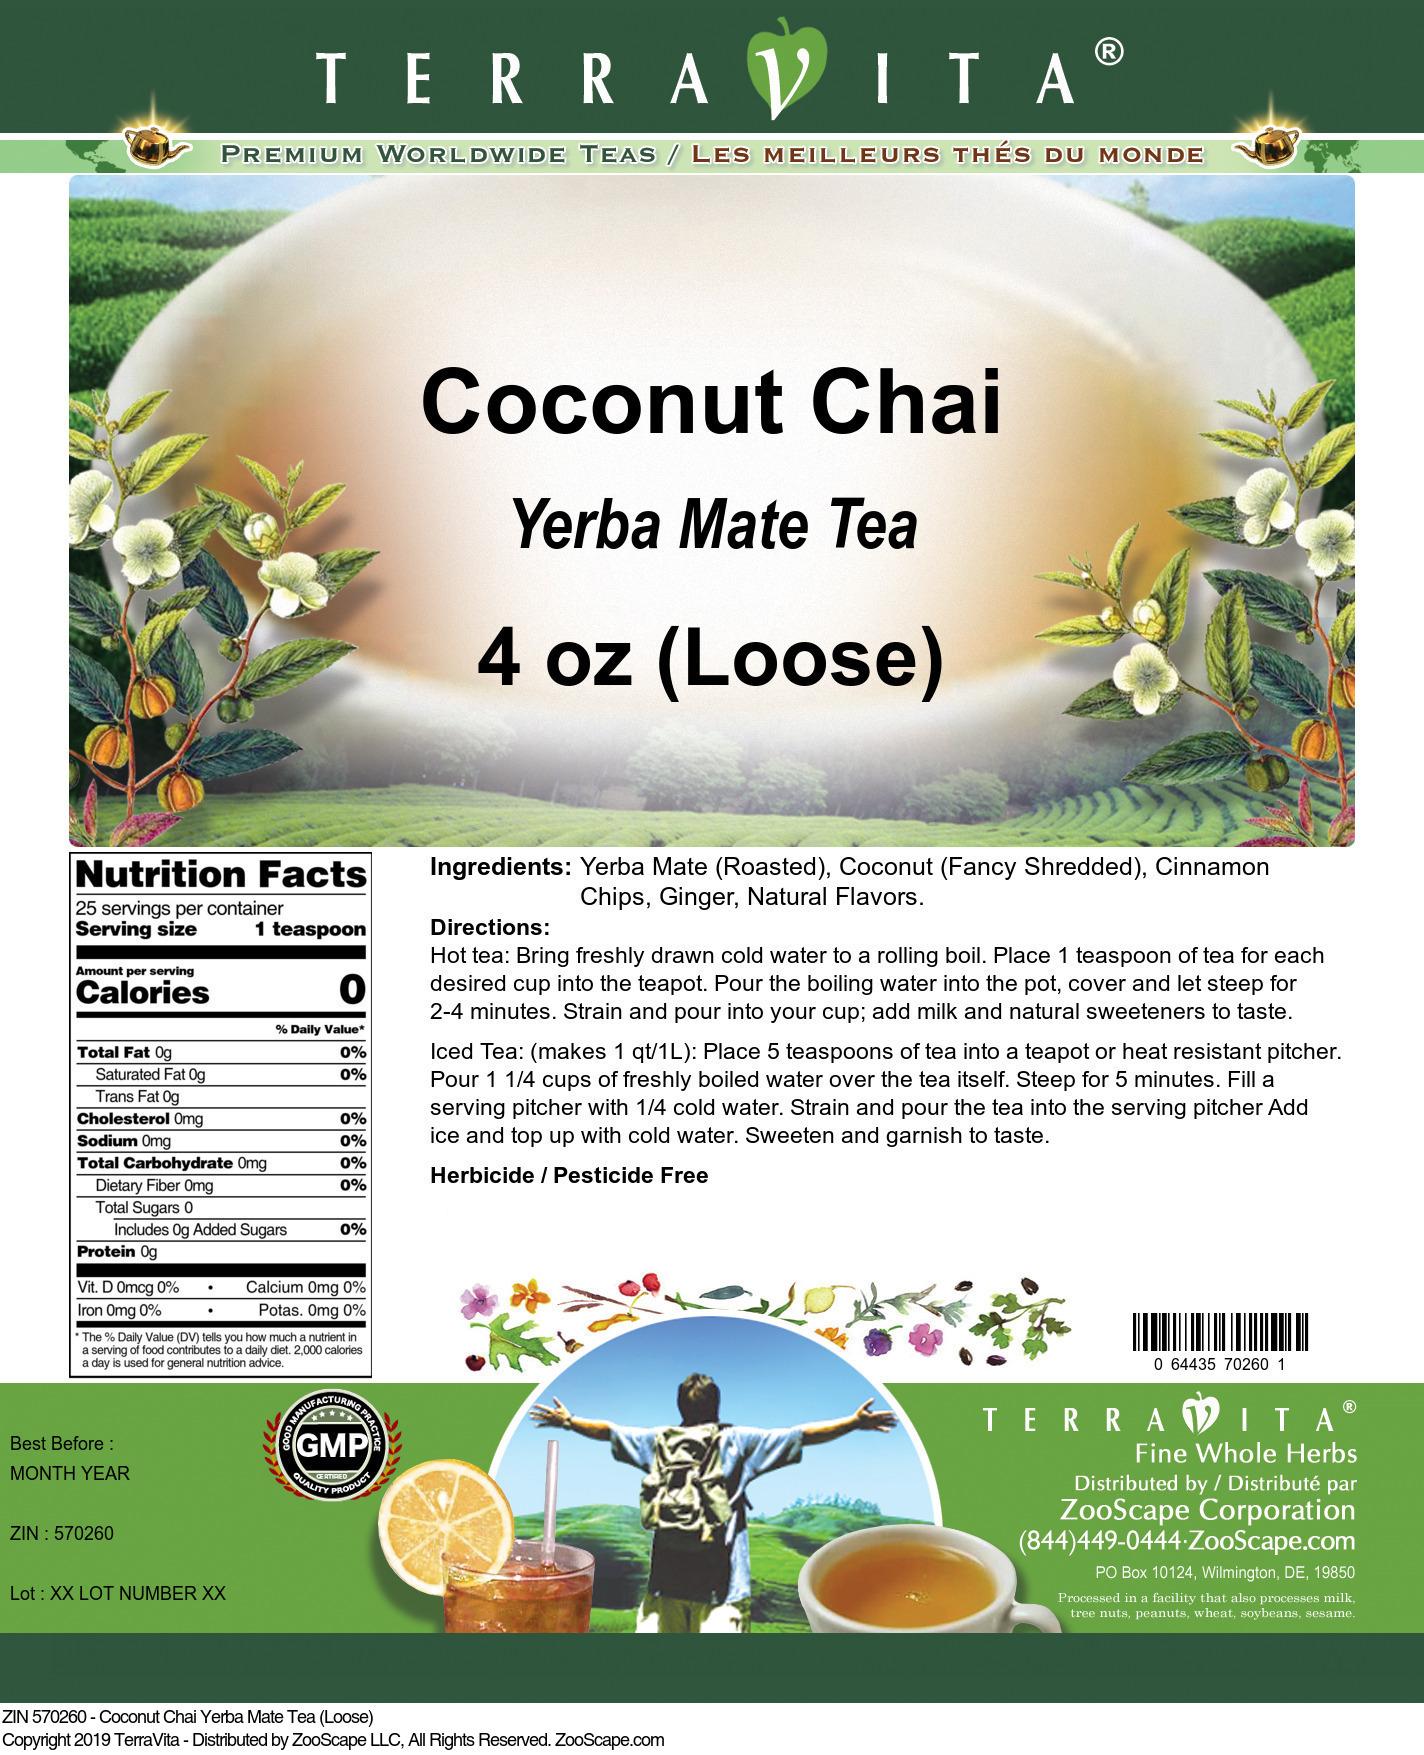 Coconut Chai Yerba Mate Tea (Loose)